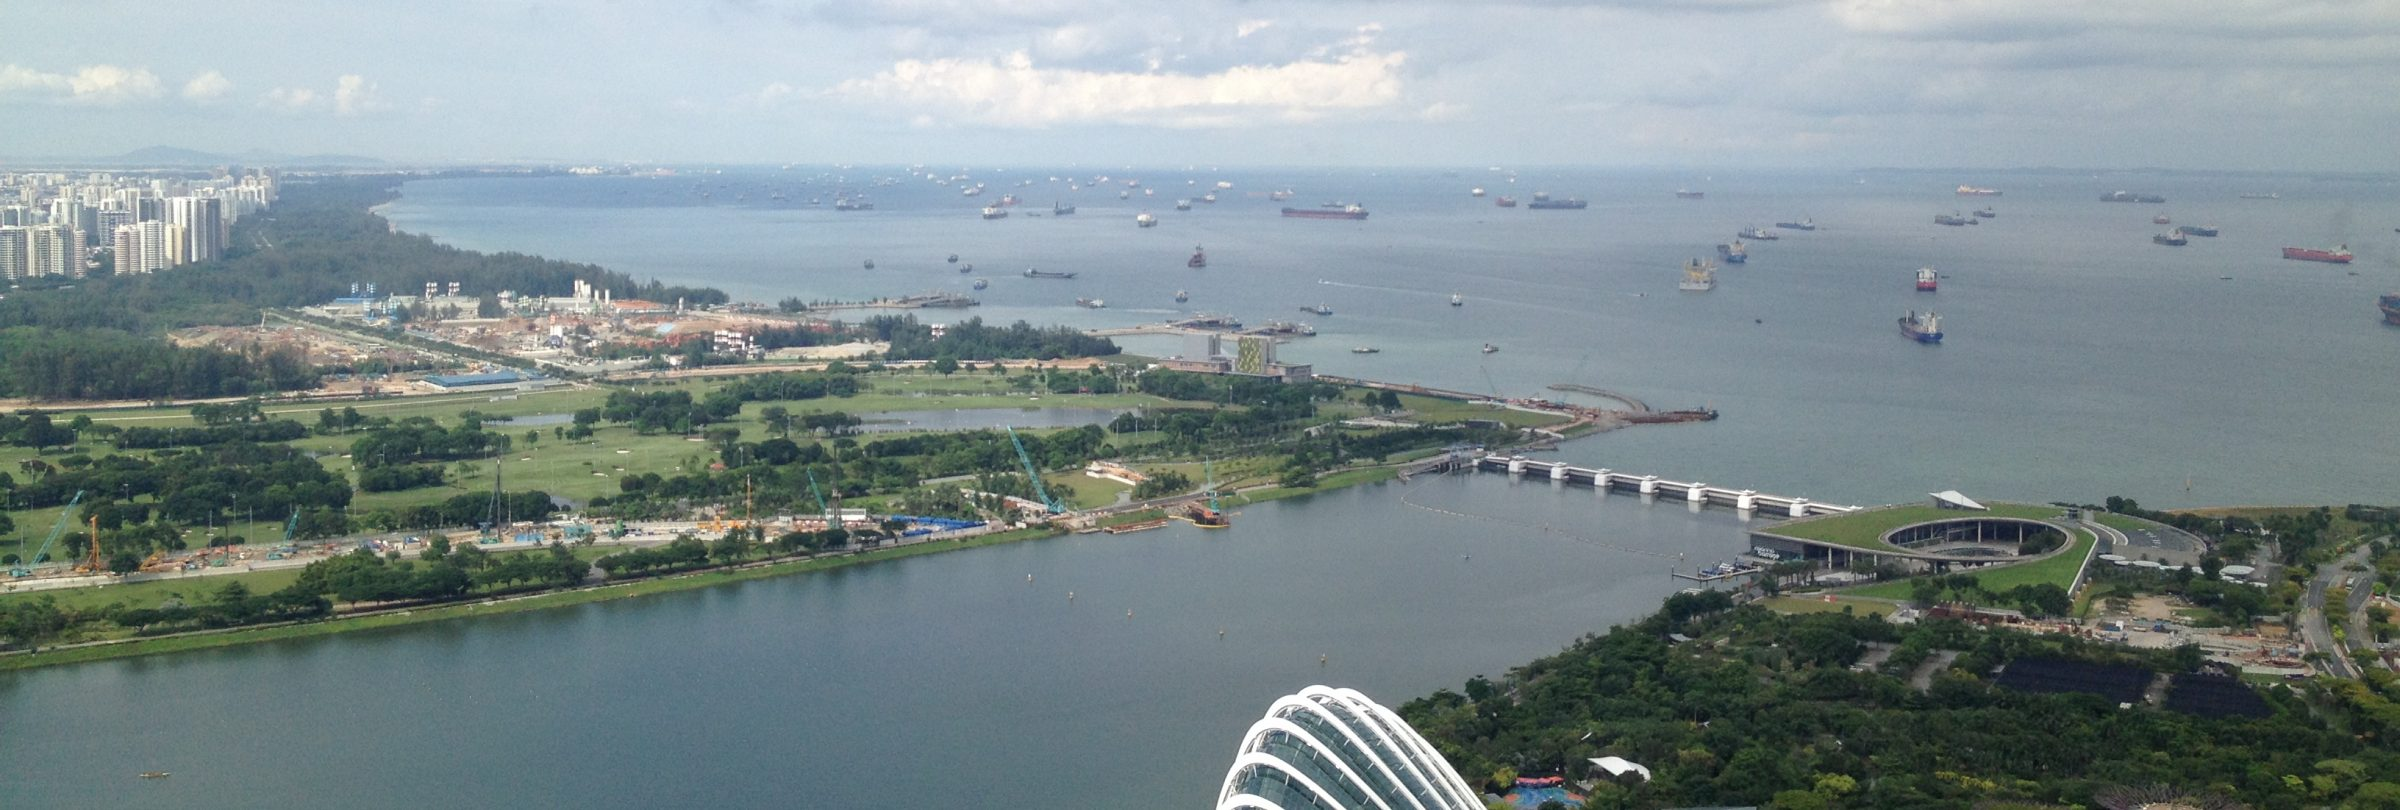 Singapore (20)